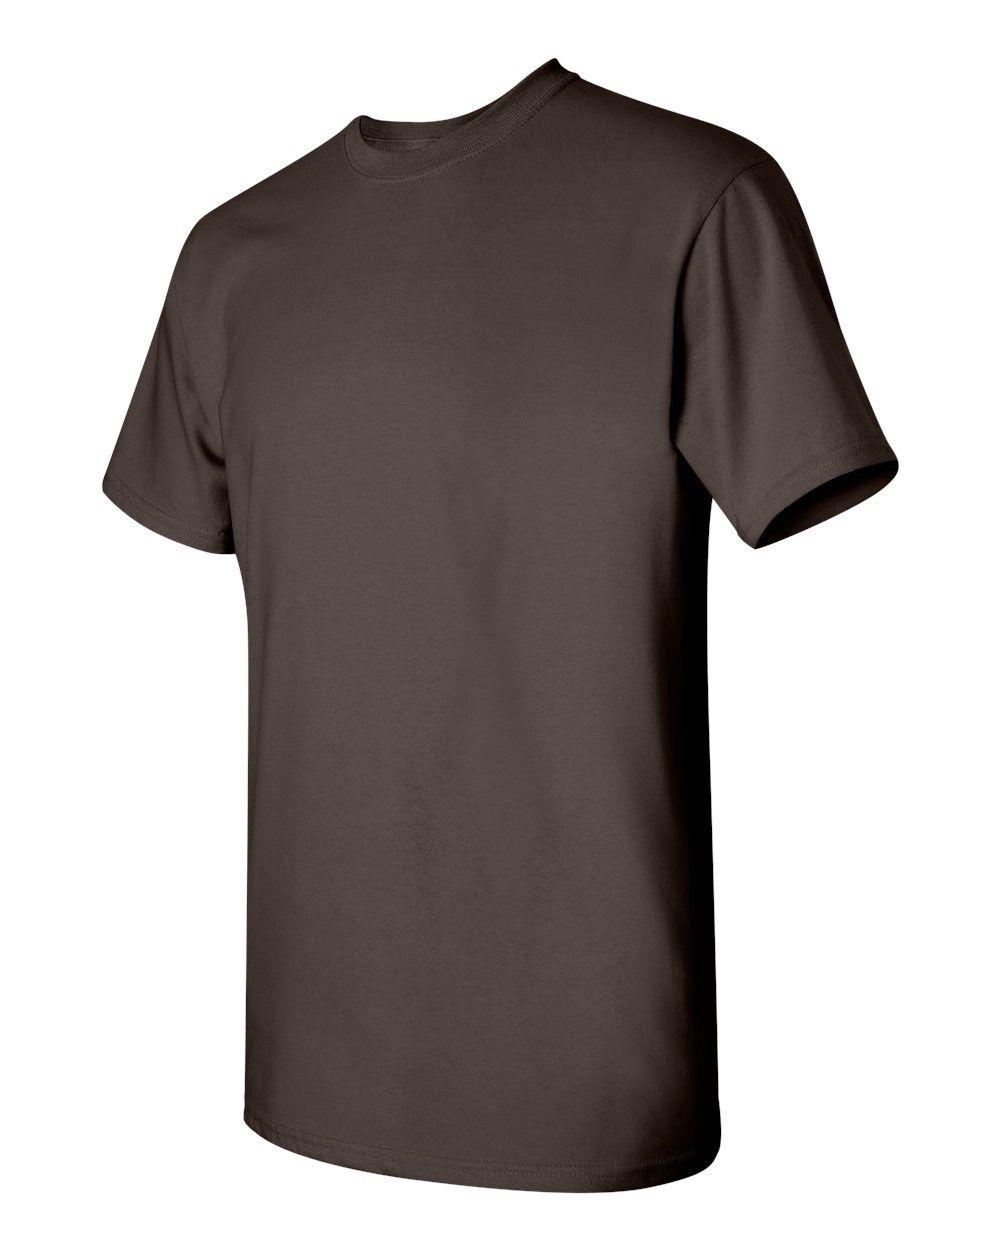 American apparel wholesale blank t shirts 50 25 25 online for Wholesale t shirts american apparel